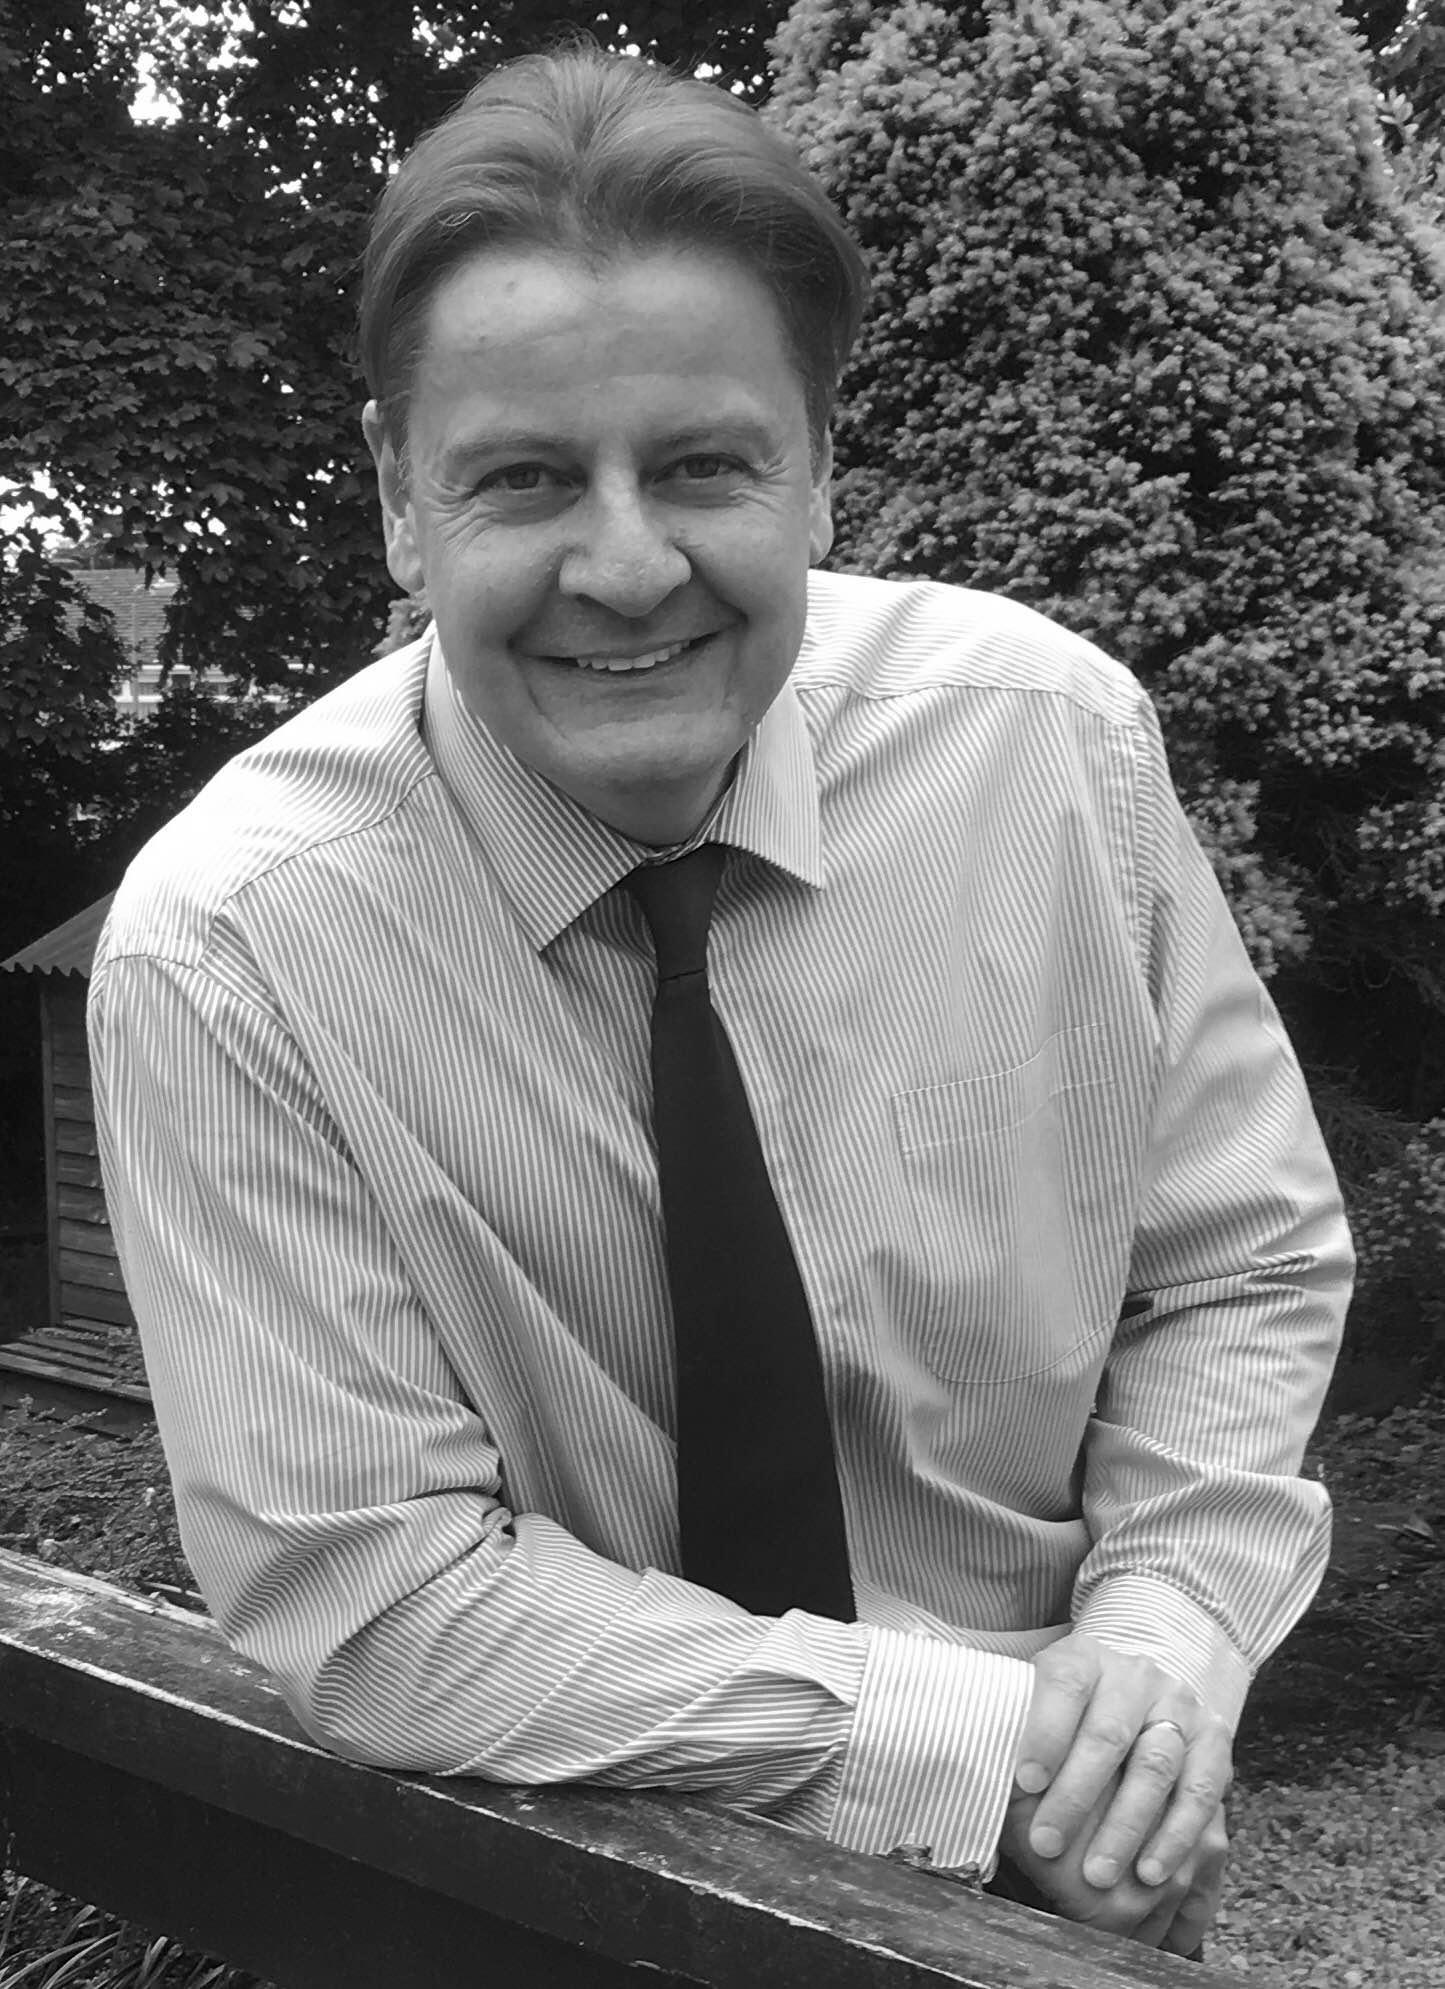 Dean Harding